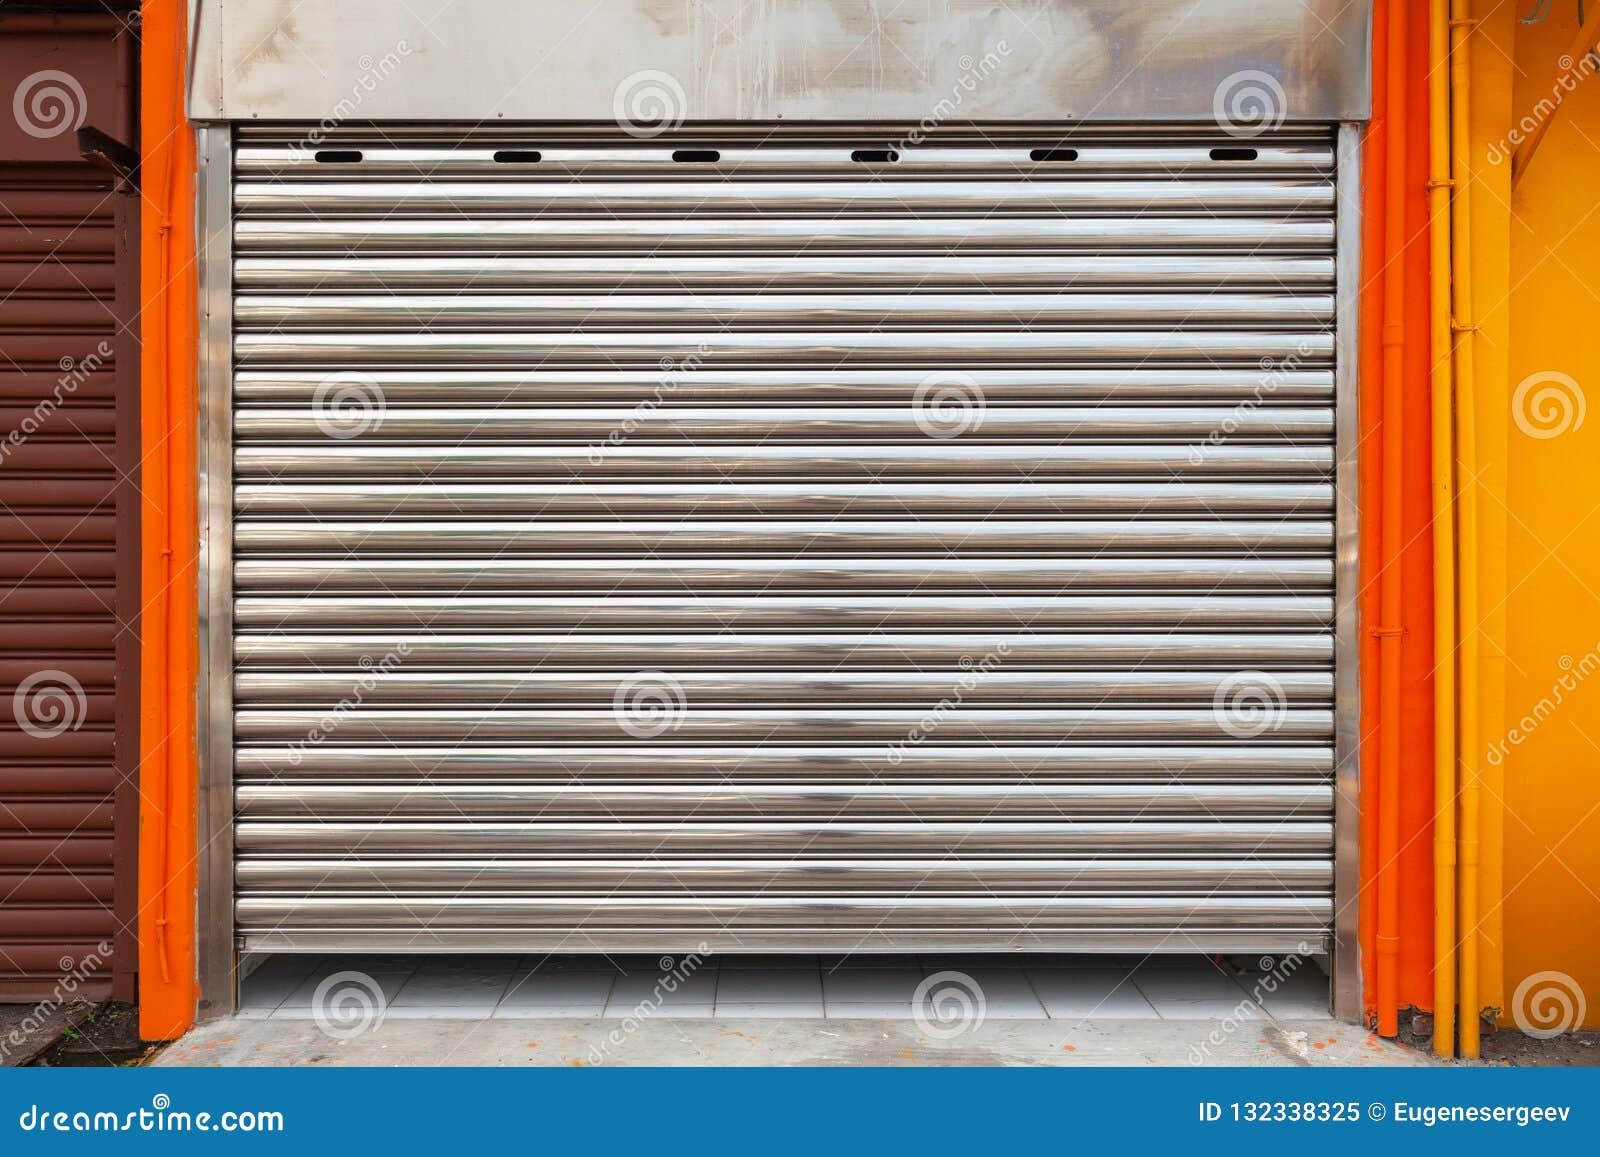 Zamknięta garażu metalu rolki brama, tekstura